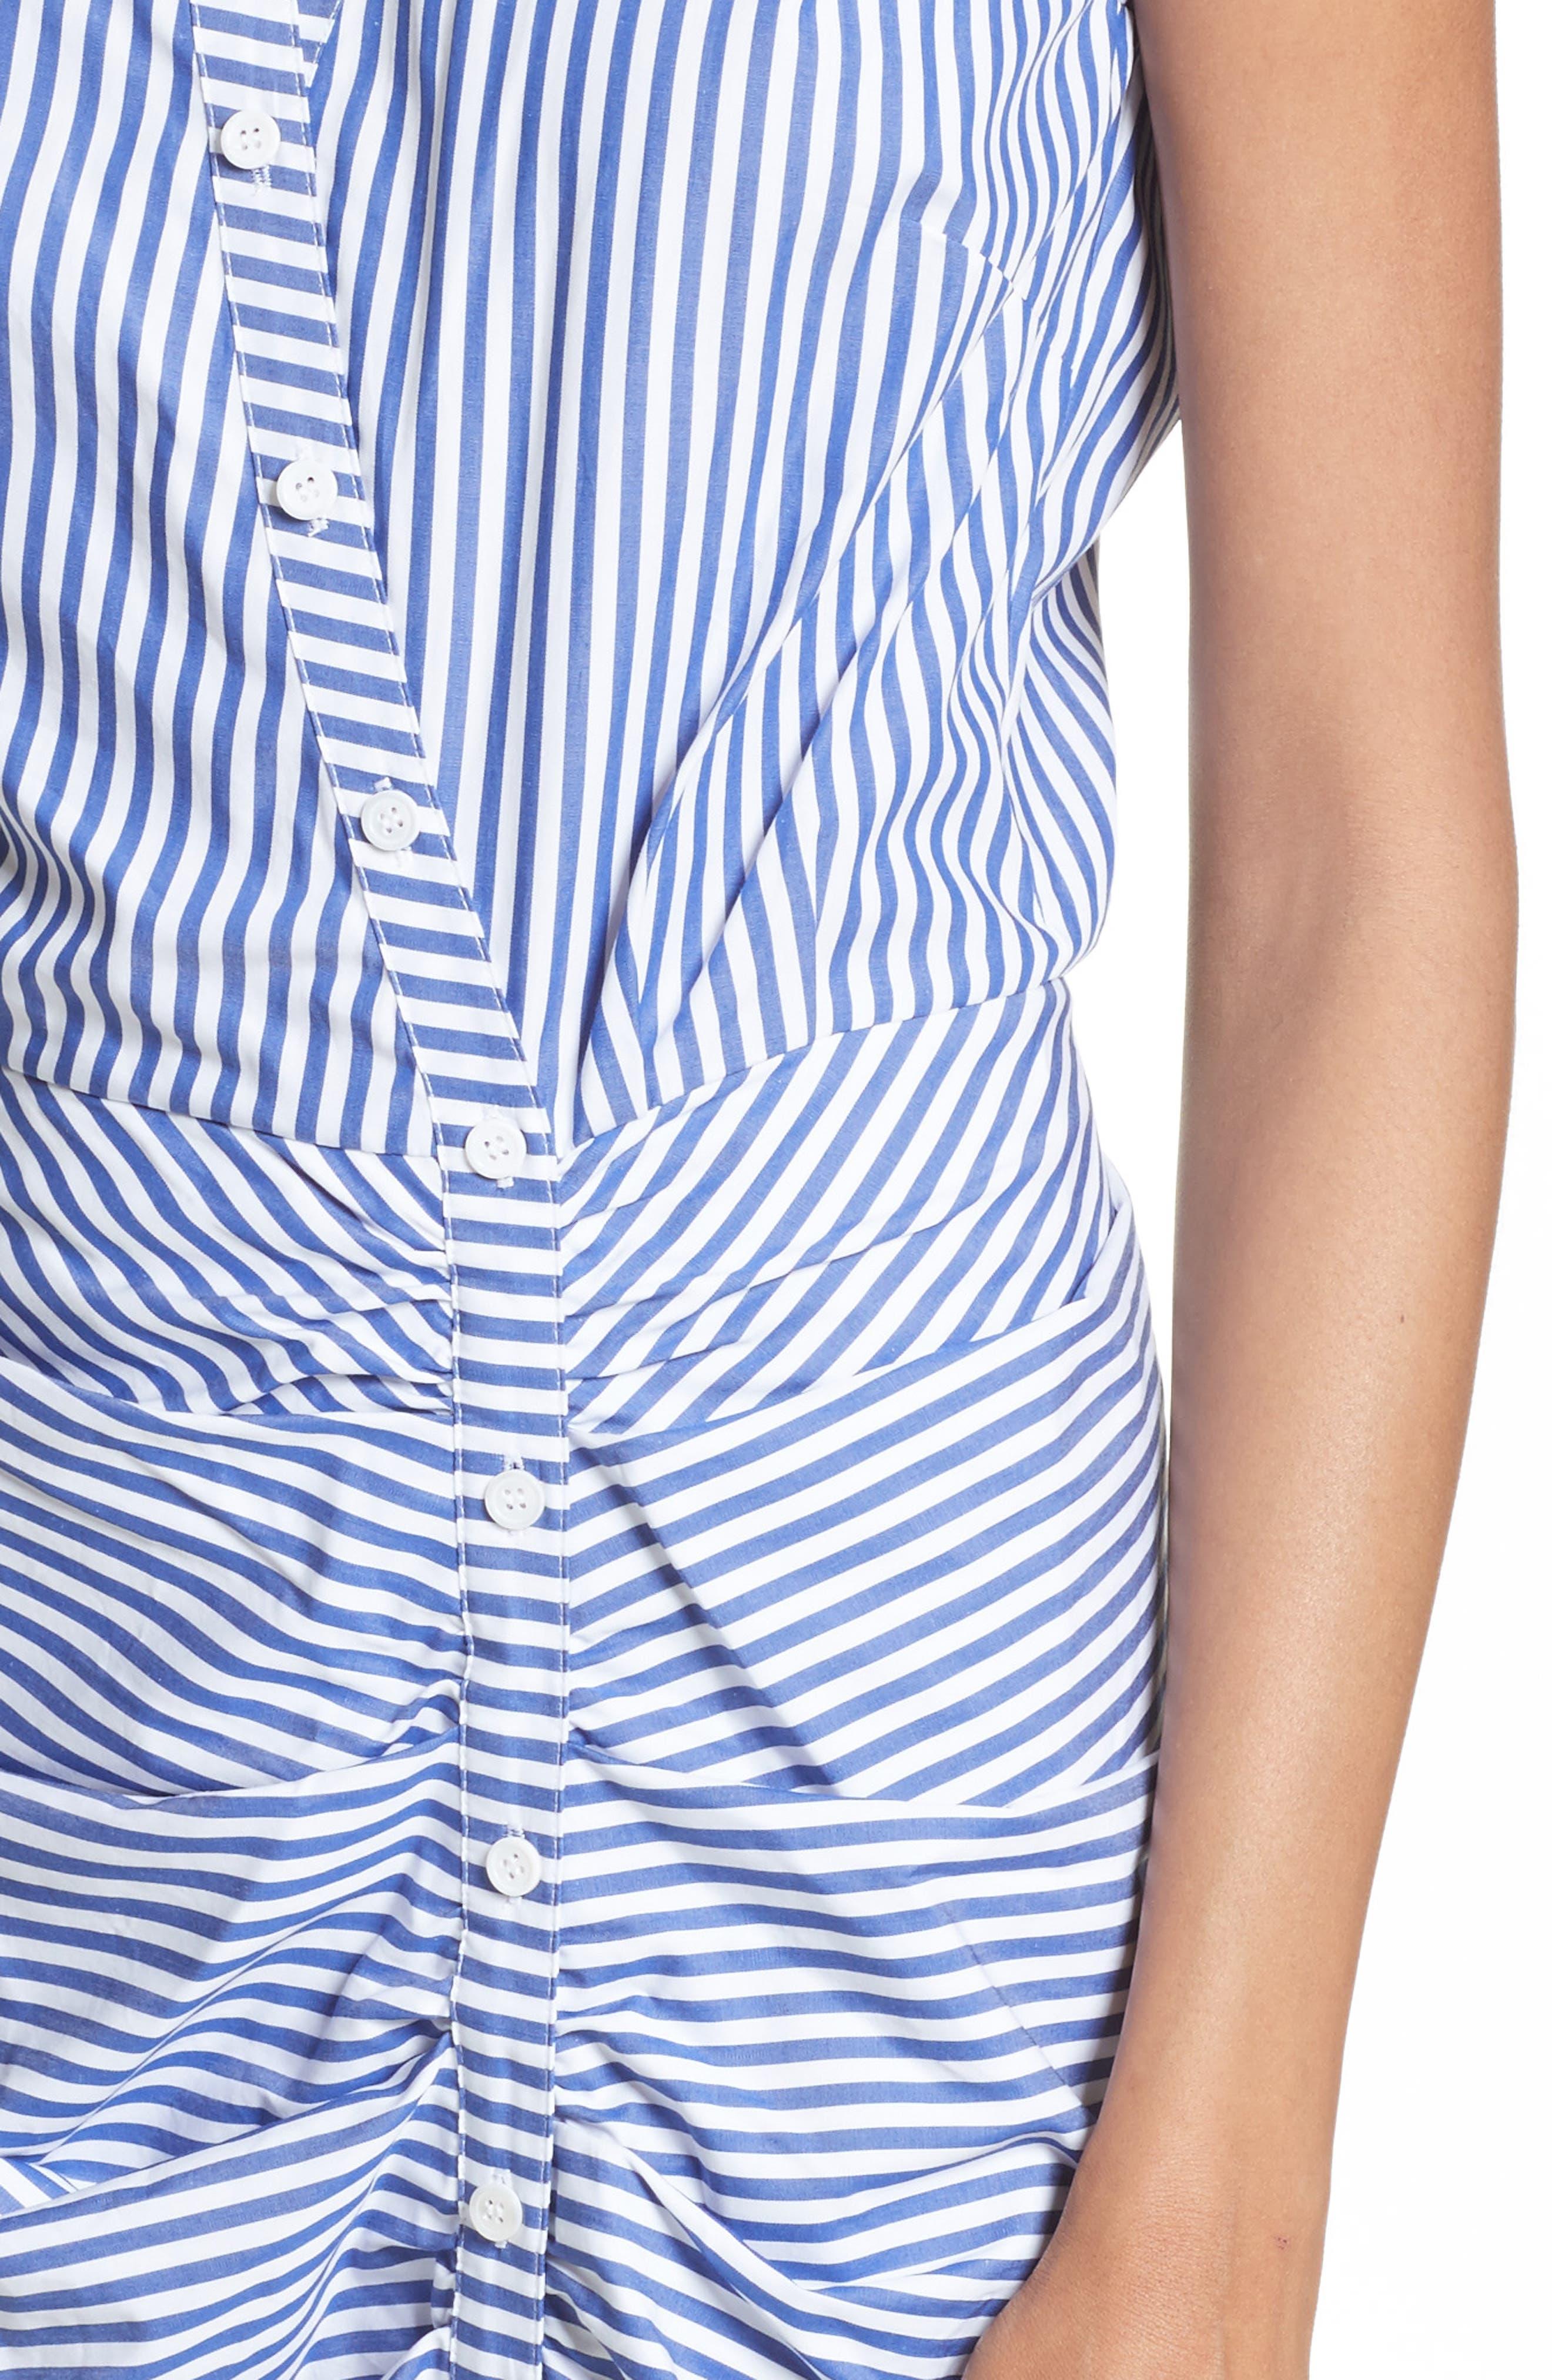 Ruched Stripe Shirtdress,                             Alternate thumbnail 4, color,                             BLUE/WHITE STRIPE